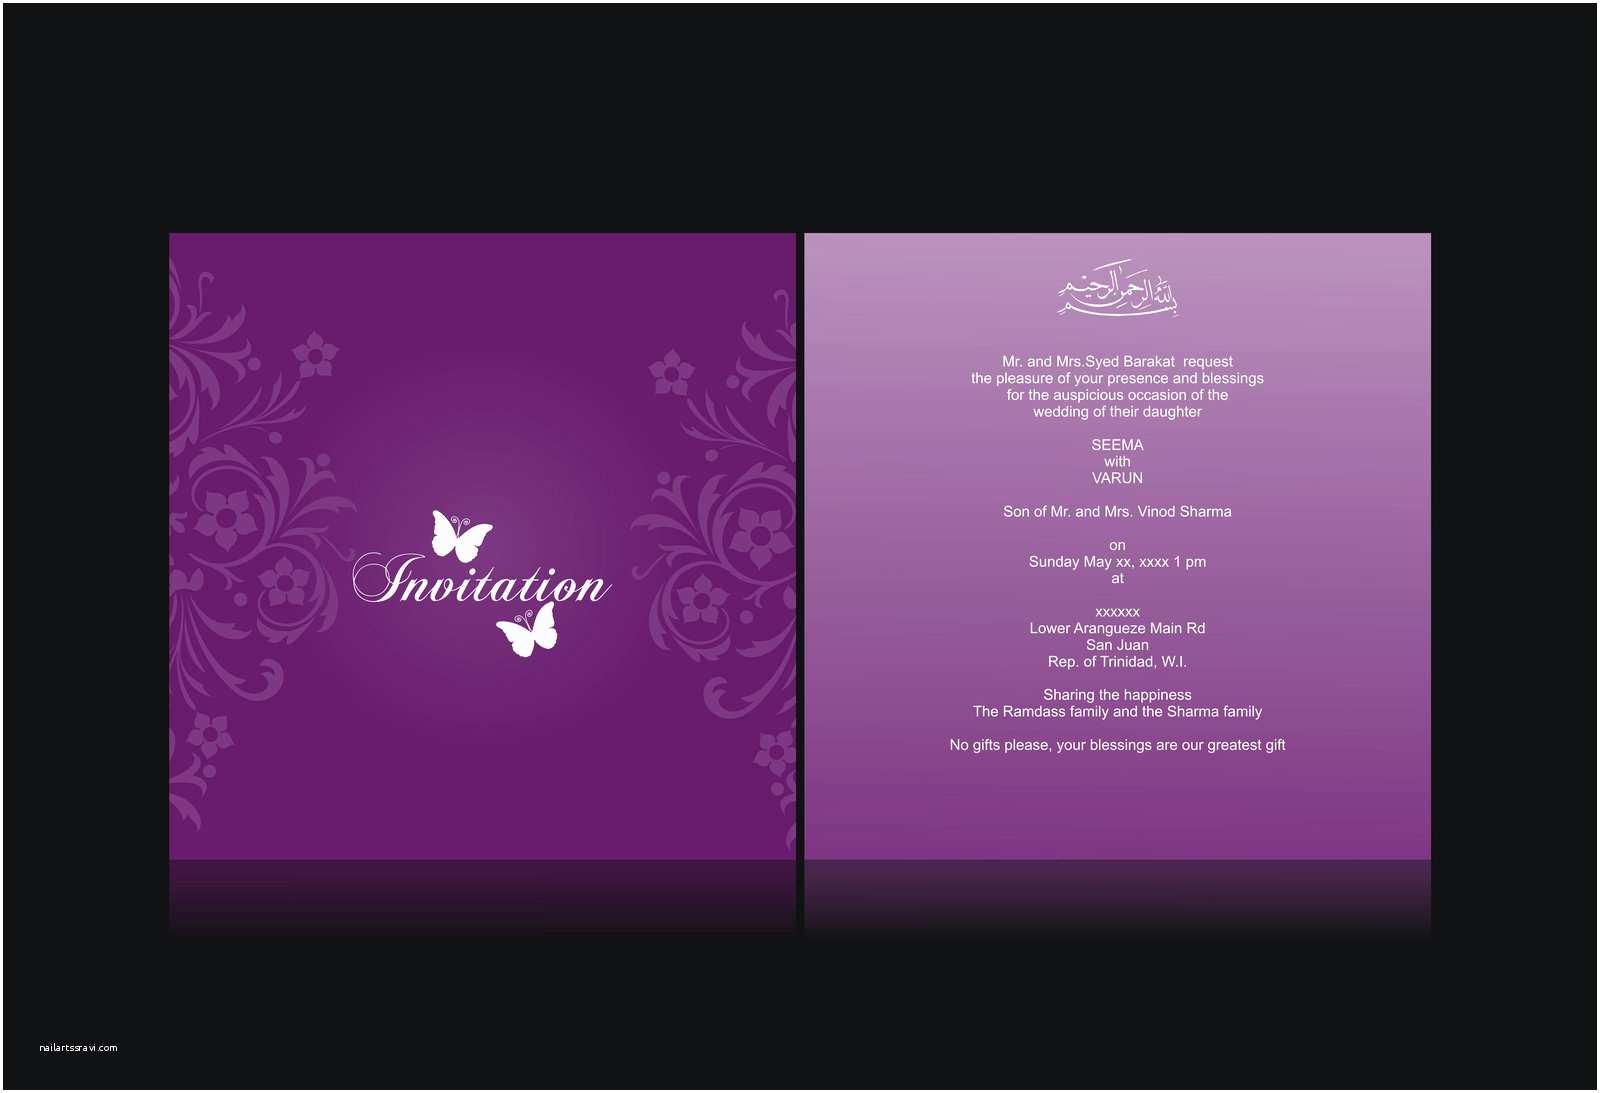 Back Of Wedding Invitation Strong Mind Wedding Invitation Card Design Purple Color